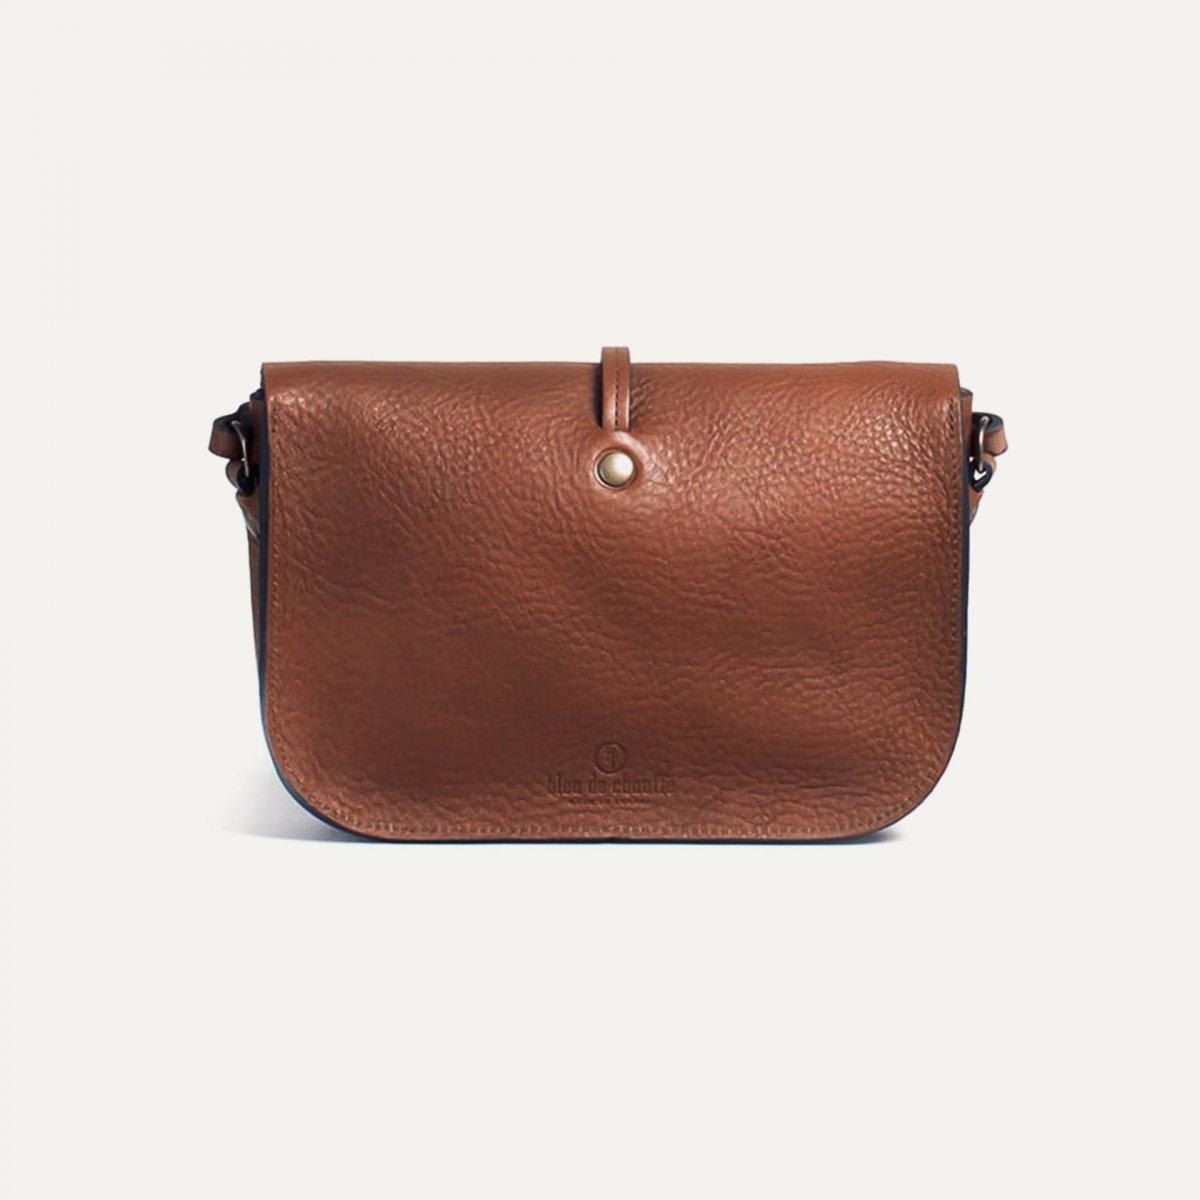 Pastis handbag - Cuba Libre (image n°3)